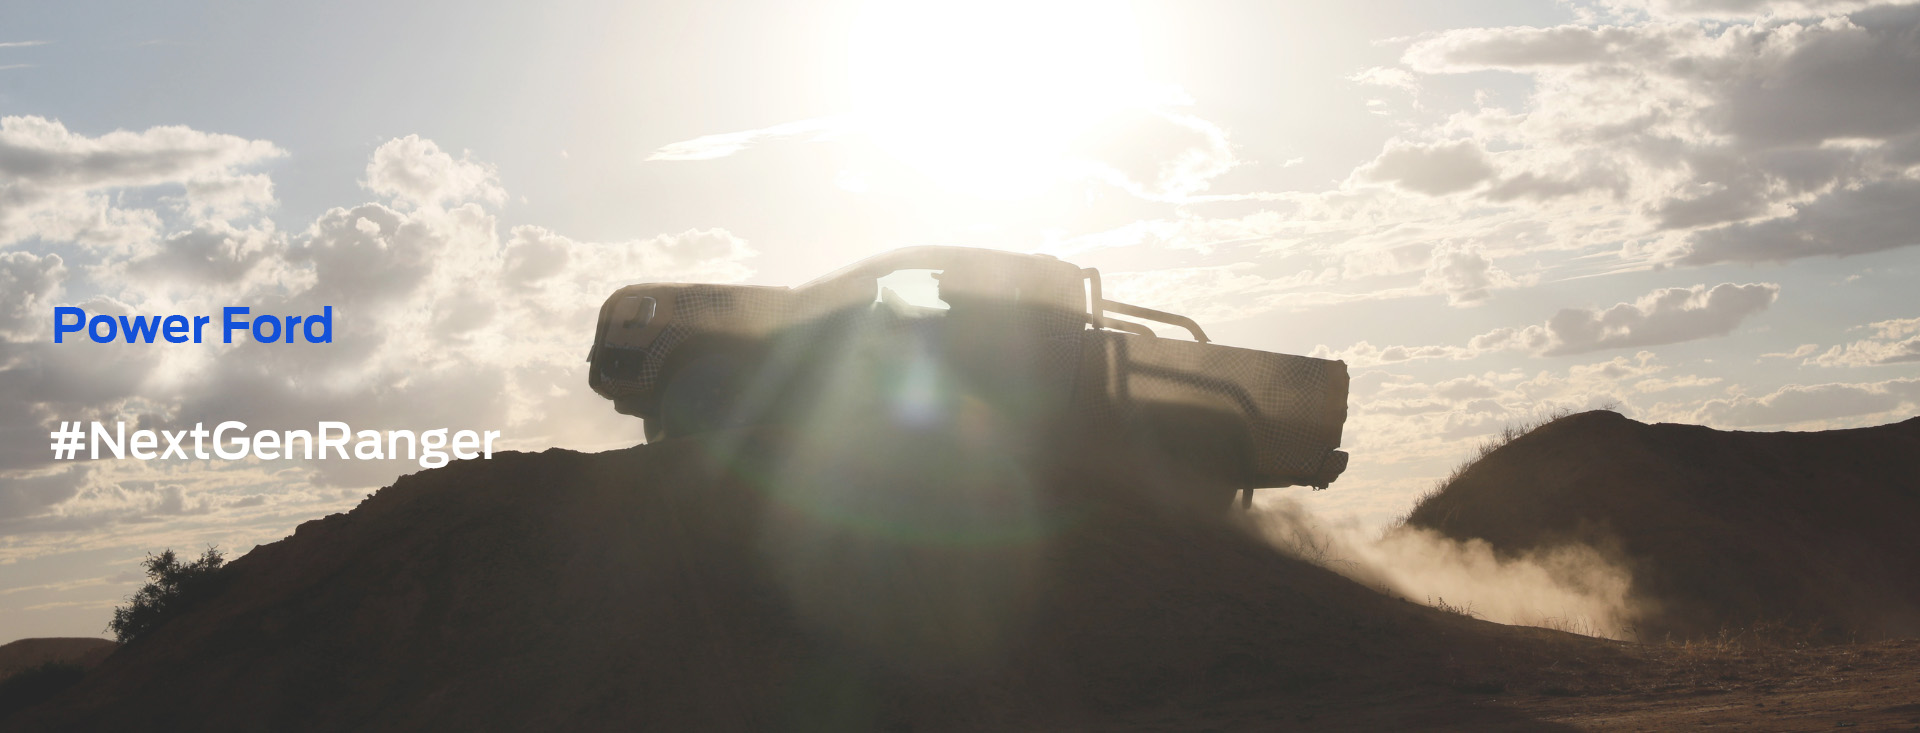 Power-Ford-Next-Gen-Ranger